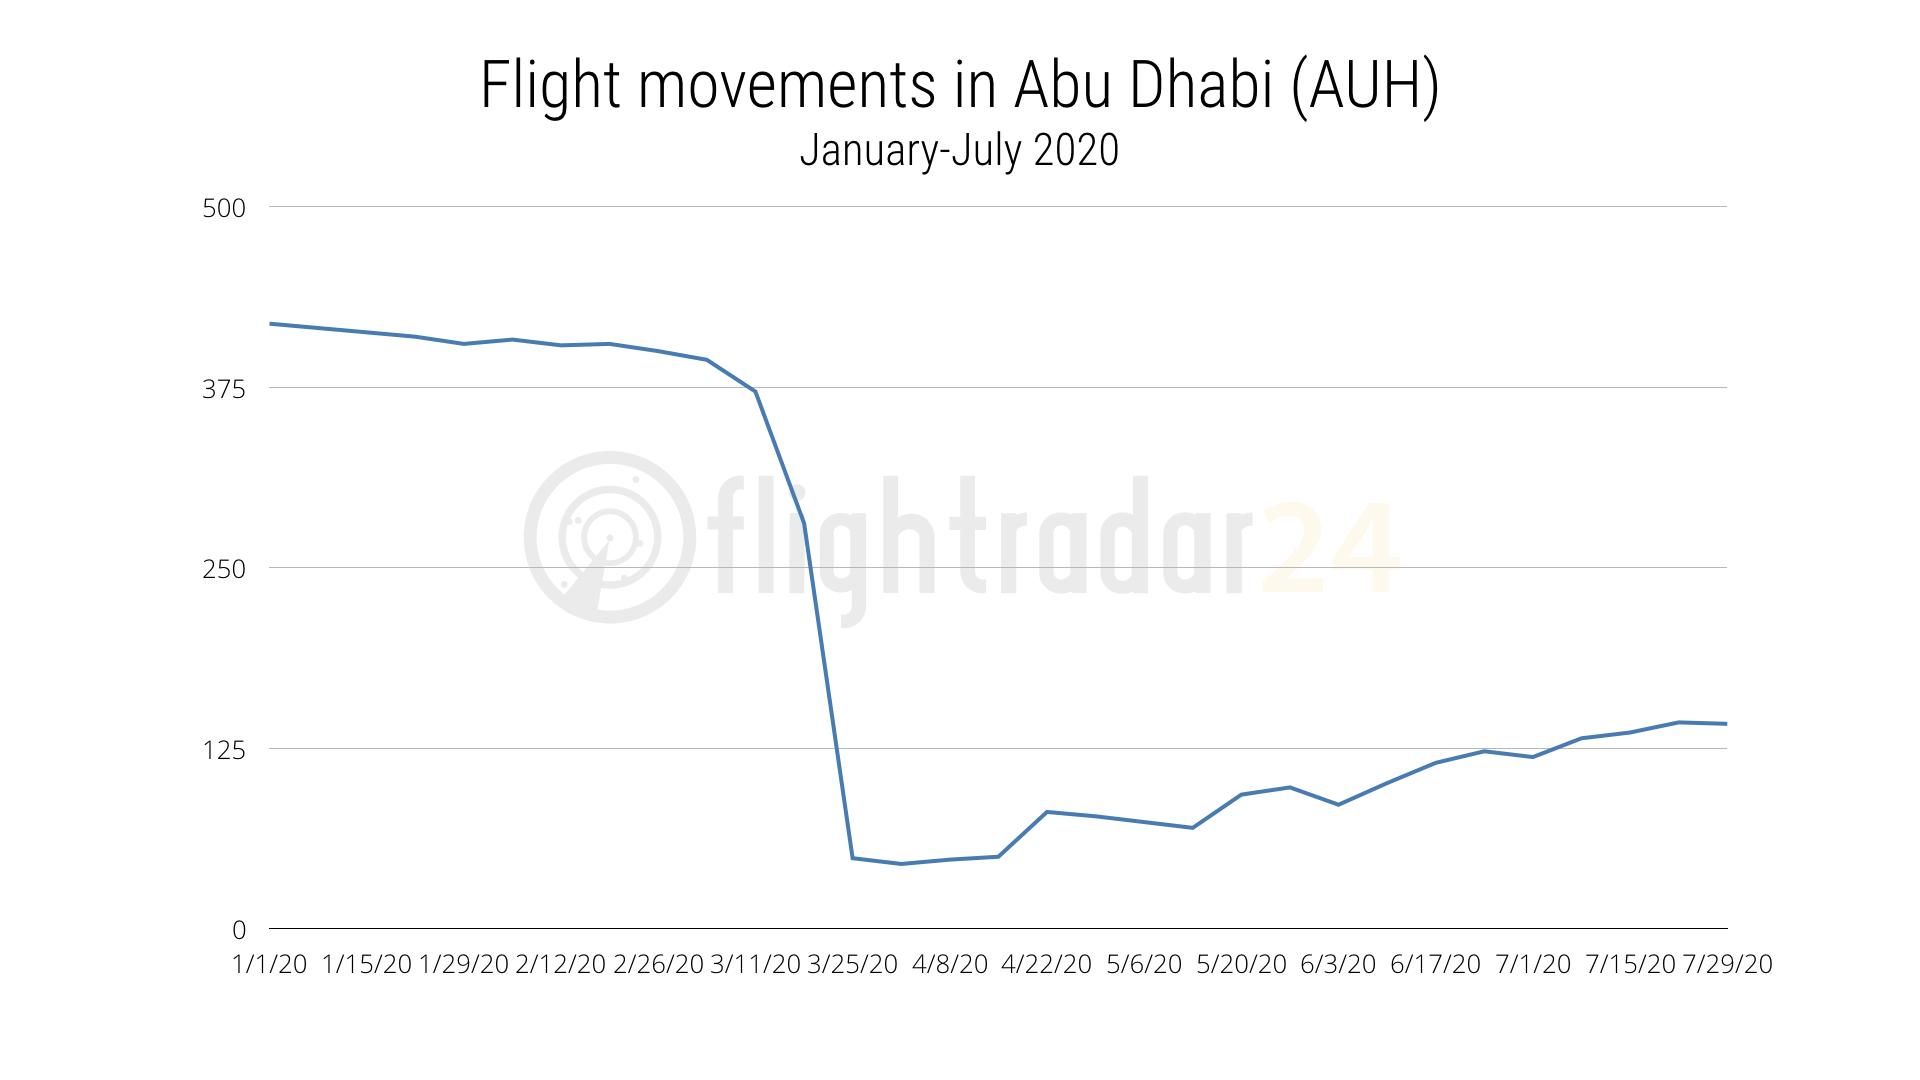 Flights to/from Abu Dhabi, January-July 2020